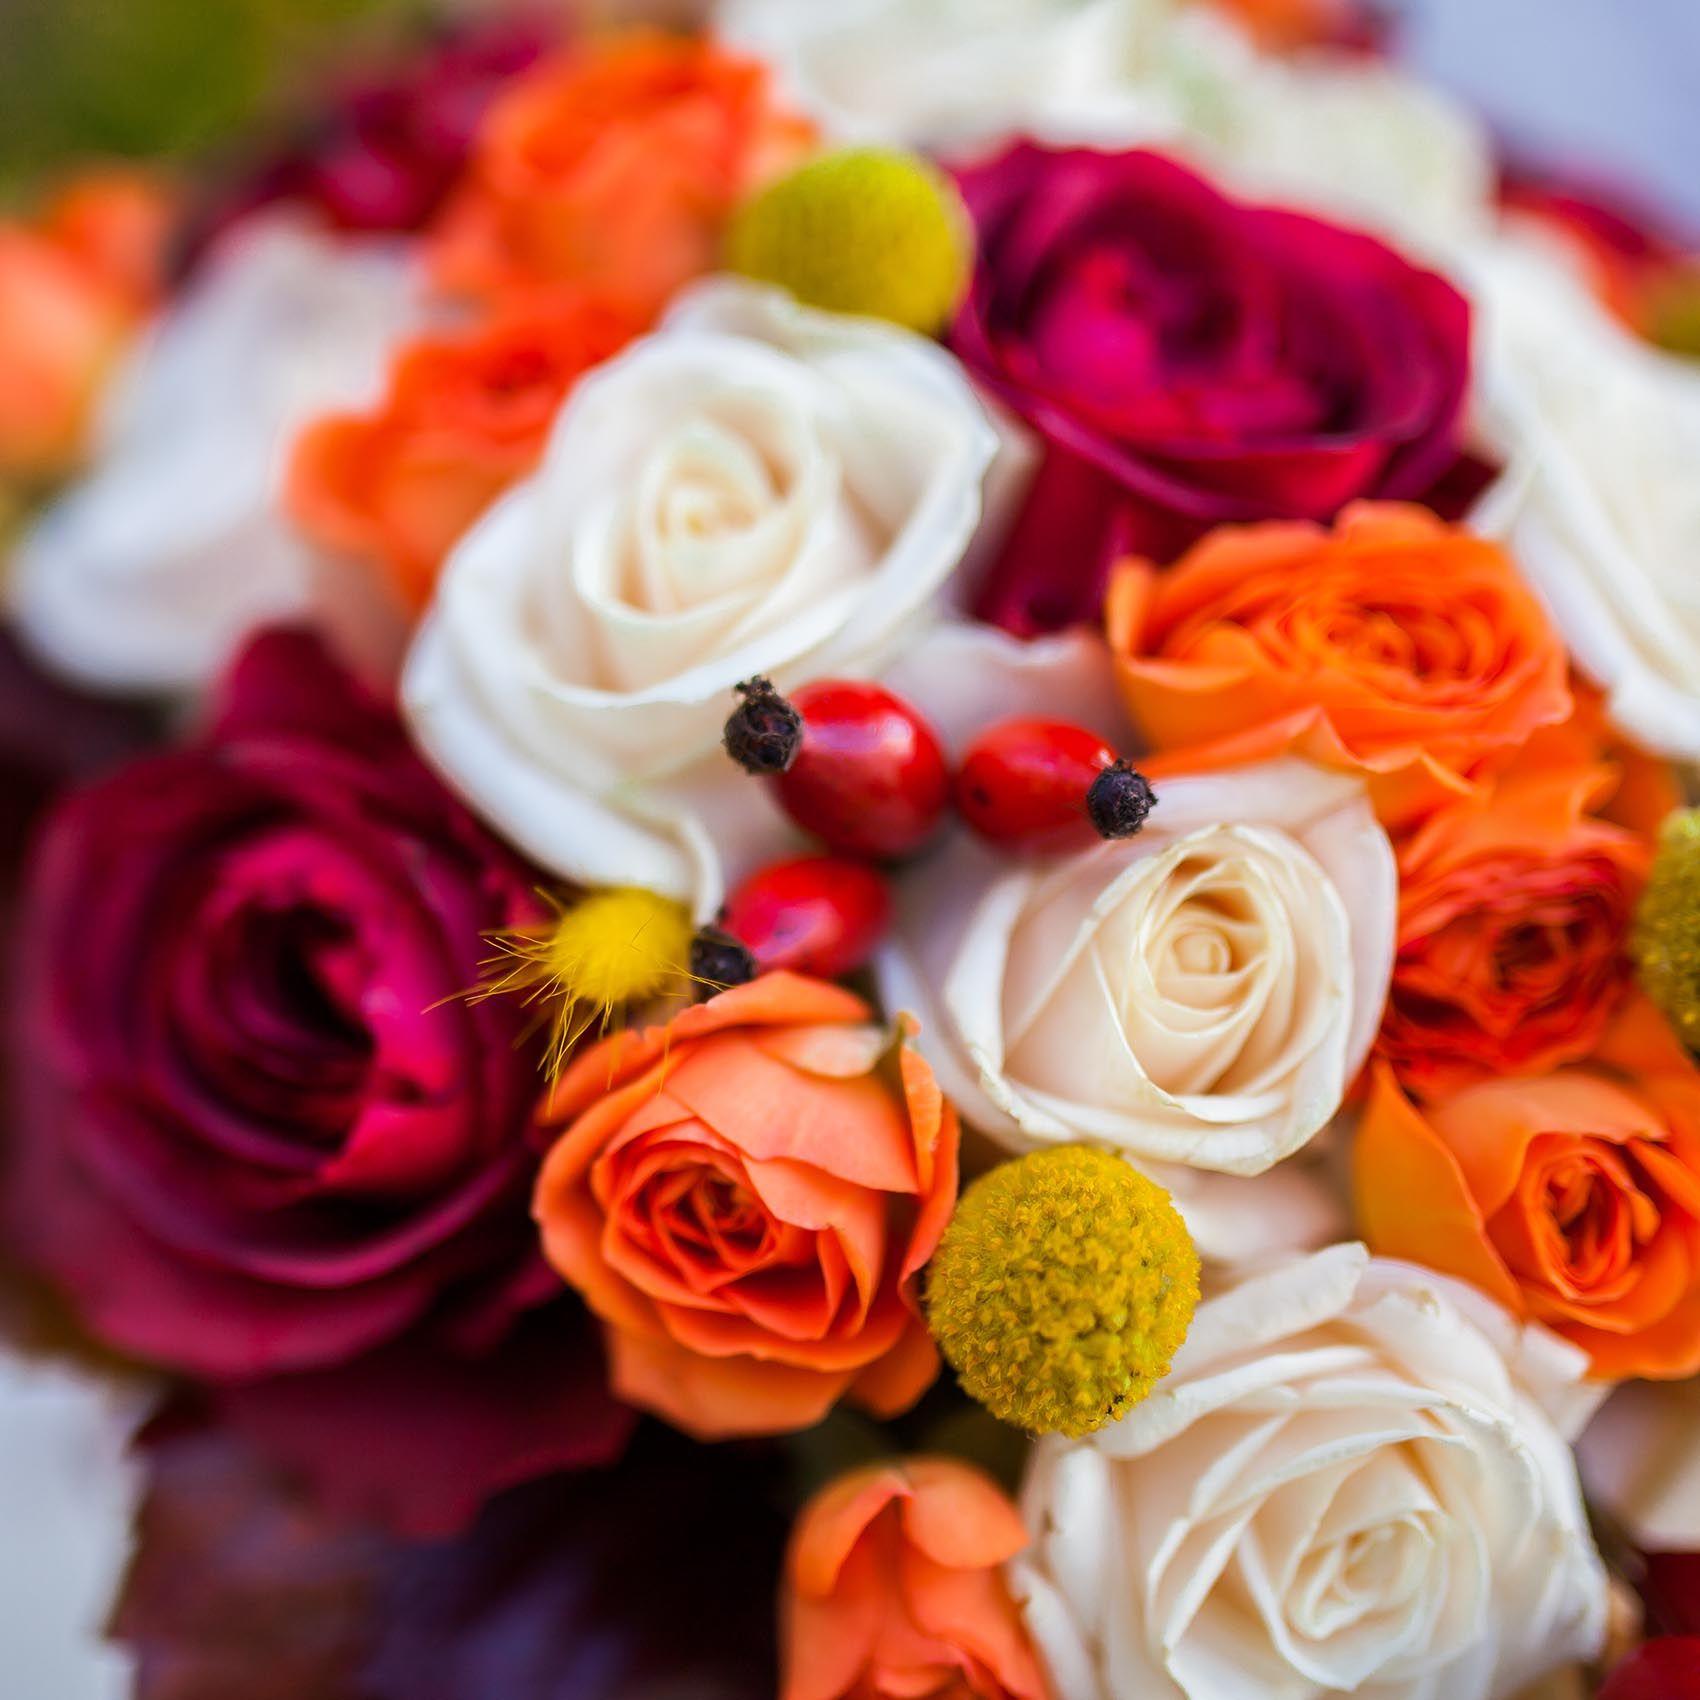 Sheffield bouquet delivery weddings funerals birthdays izmirmasajfo